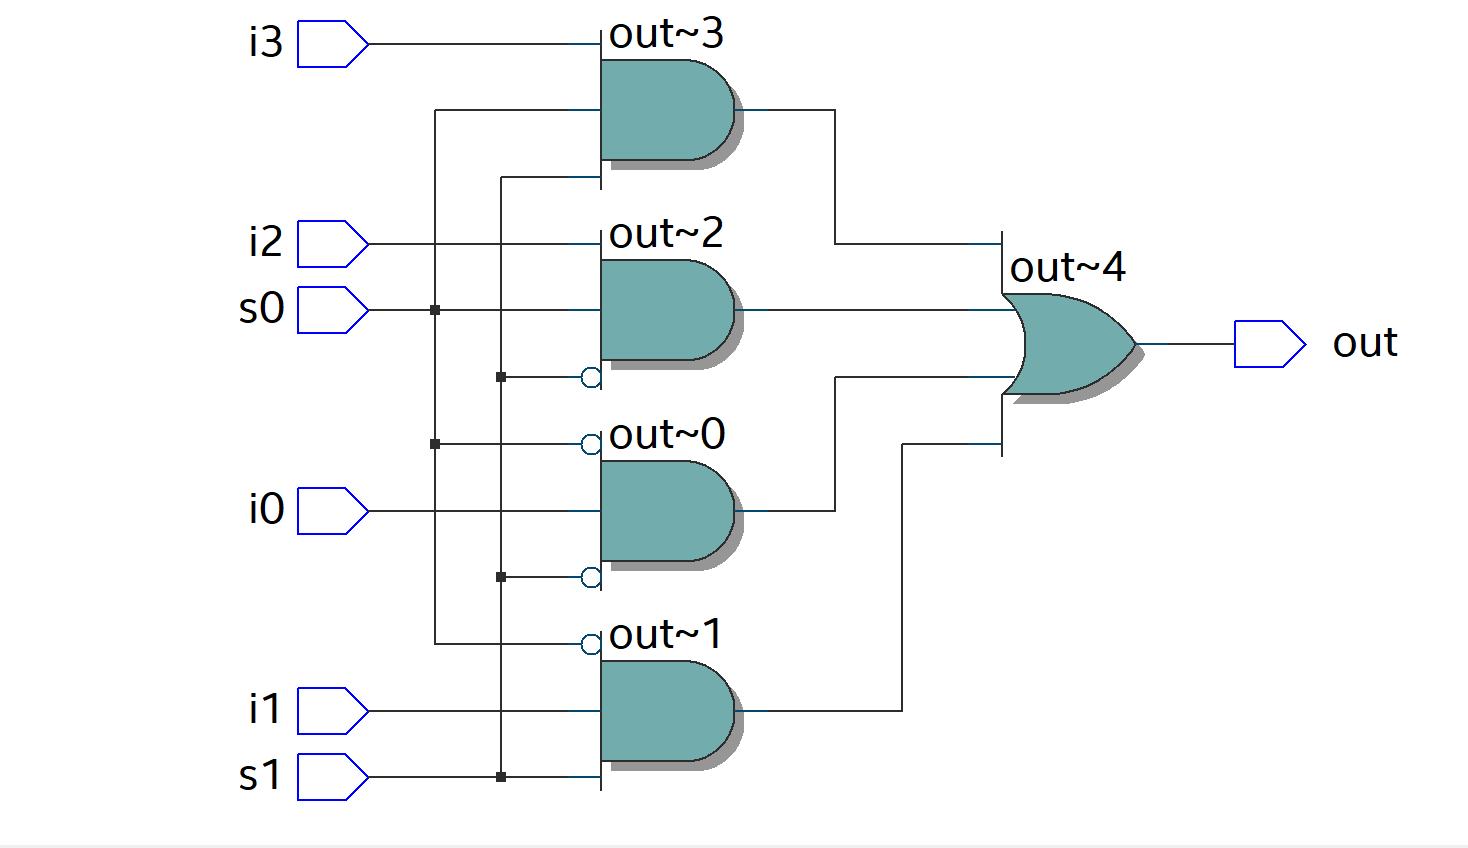 medium resolution of 4 1 mux using logic equations and conditional operator verilog